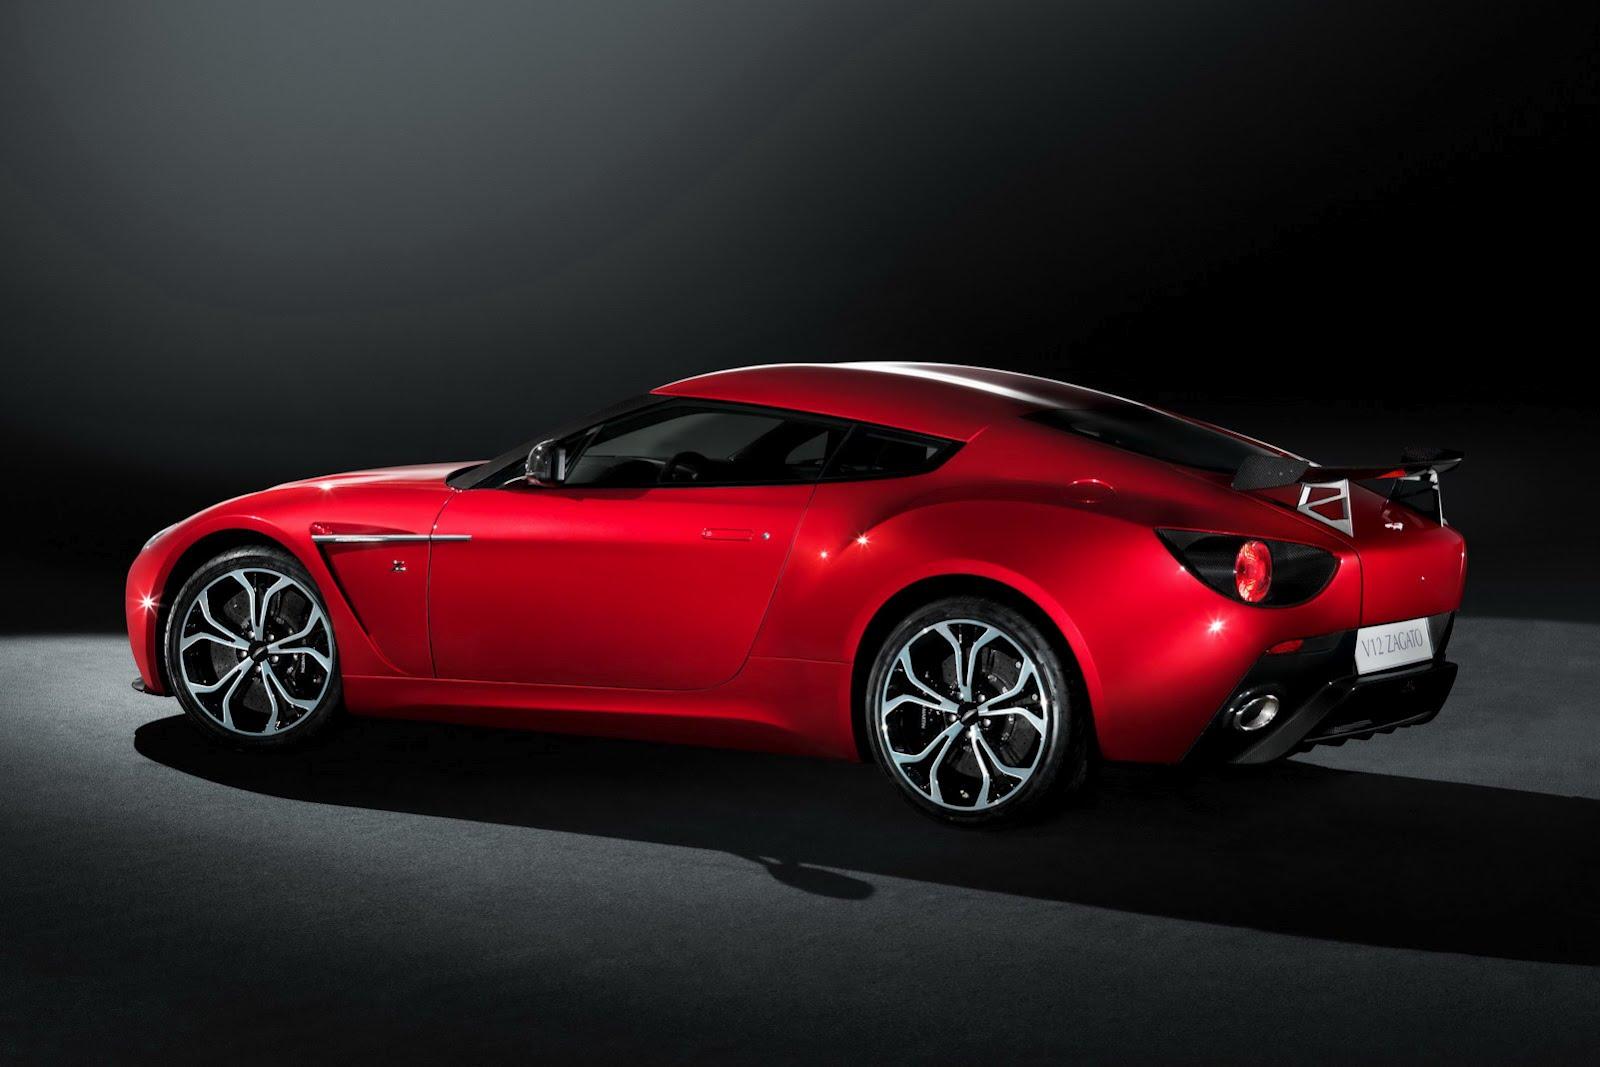 http://3.bp.blogspot.com/-eNIkWlaUIAc/Tzz23NSy5II/AAAAAAAAEMg/B7ap2PtILuE/s1600/Aston-Martin-V12.jpg